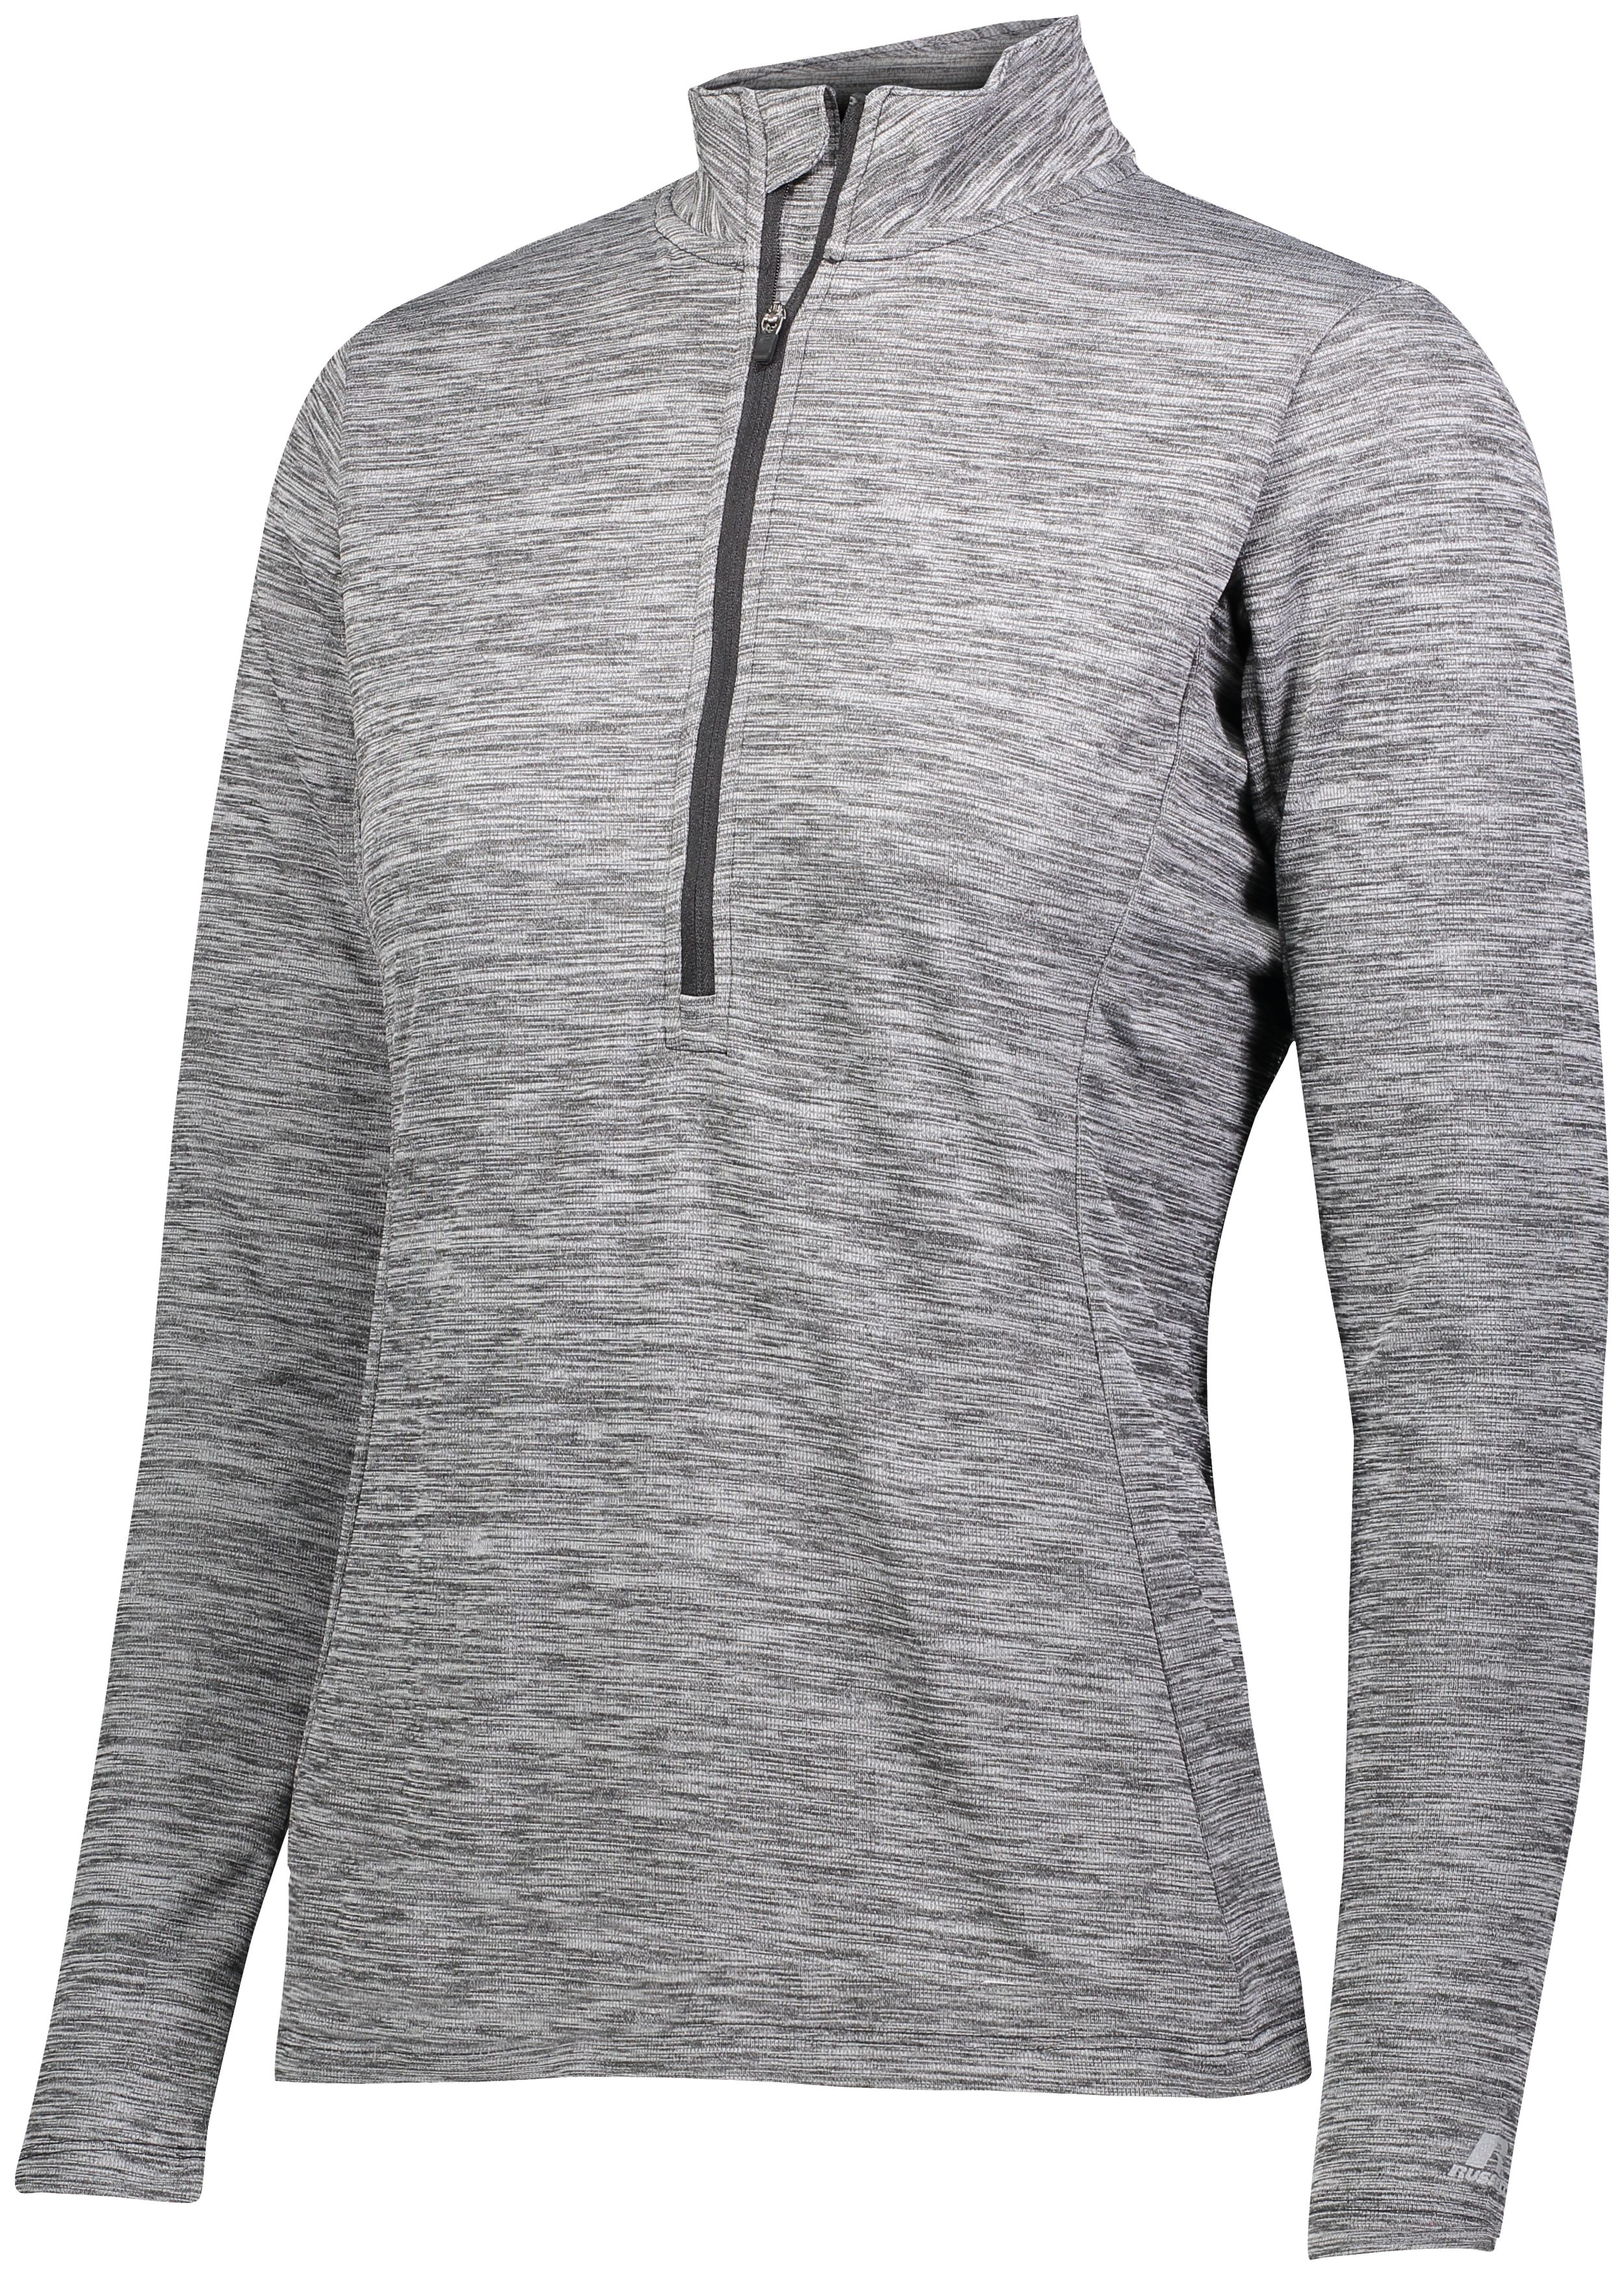 Ladies Dri-Power Lightweight 1/4 Zip Pullover - Black